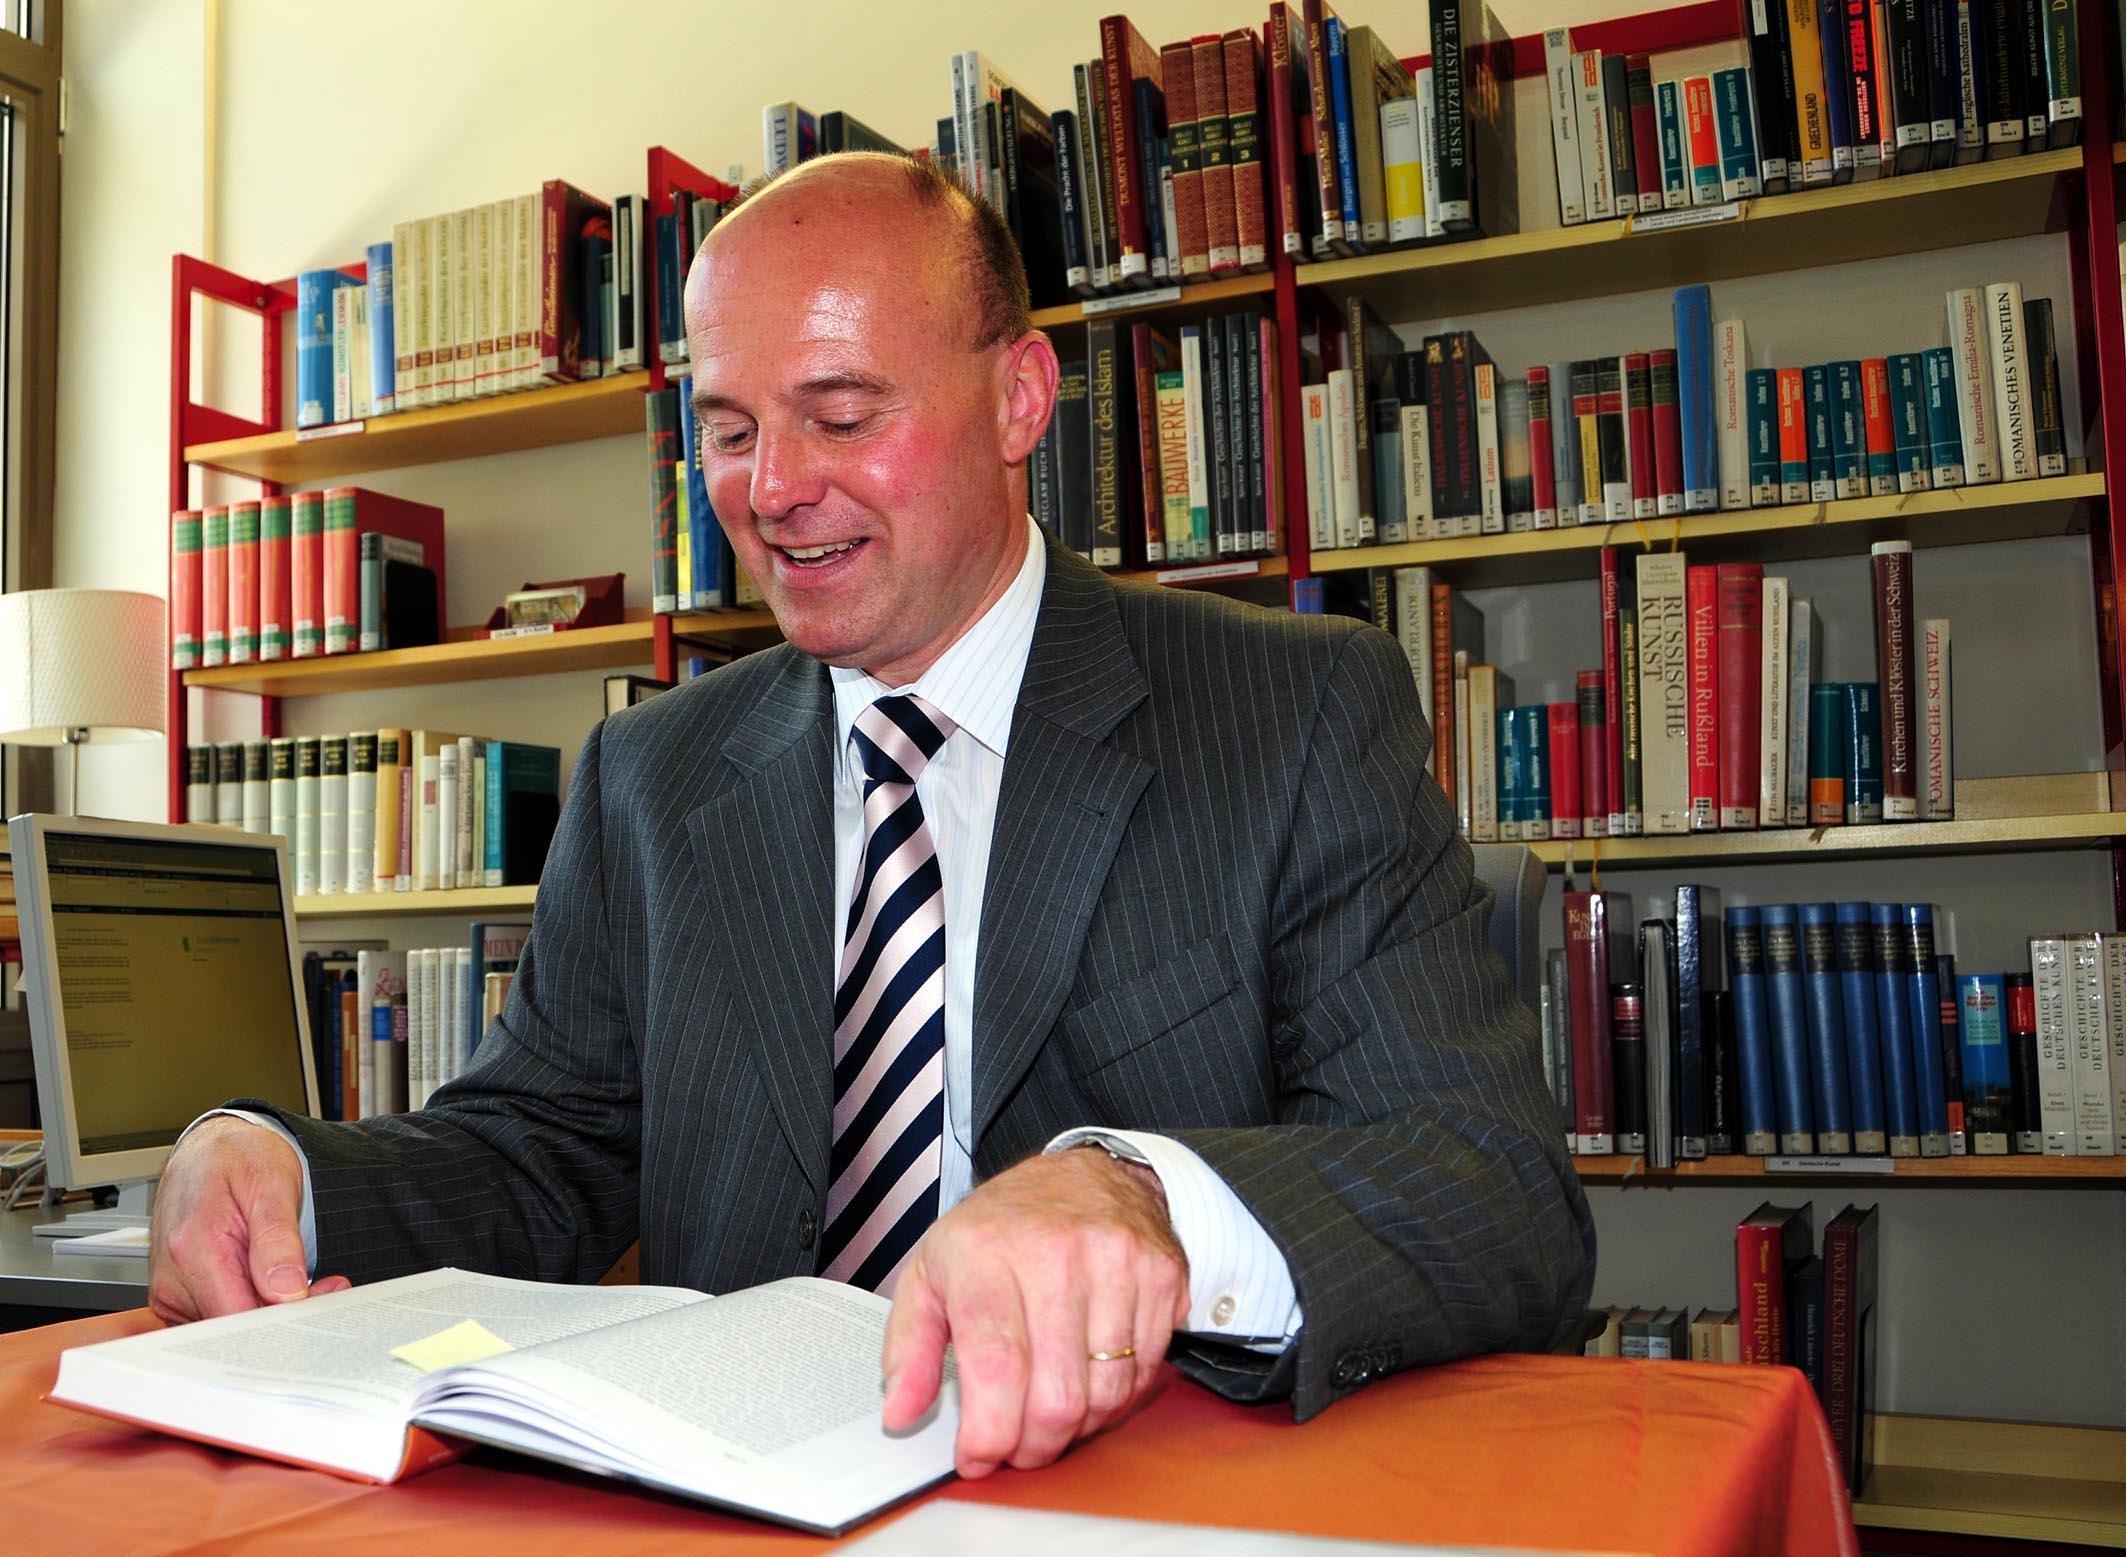 koschyk-lesung-stadtbibliothek-2